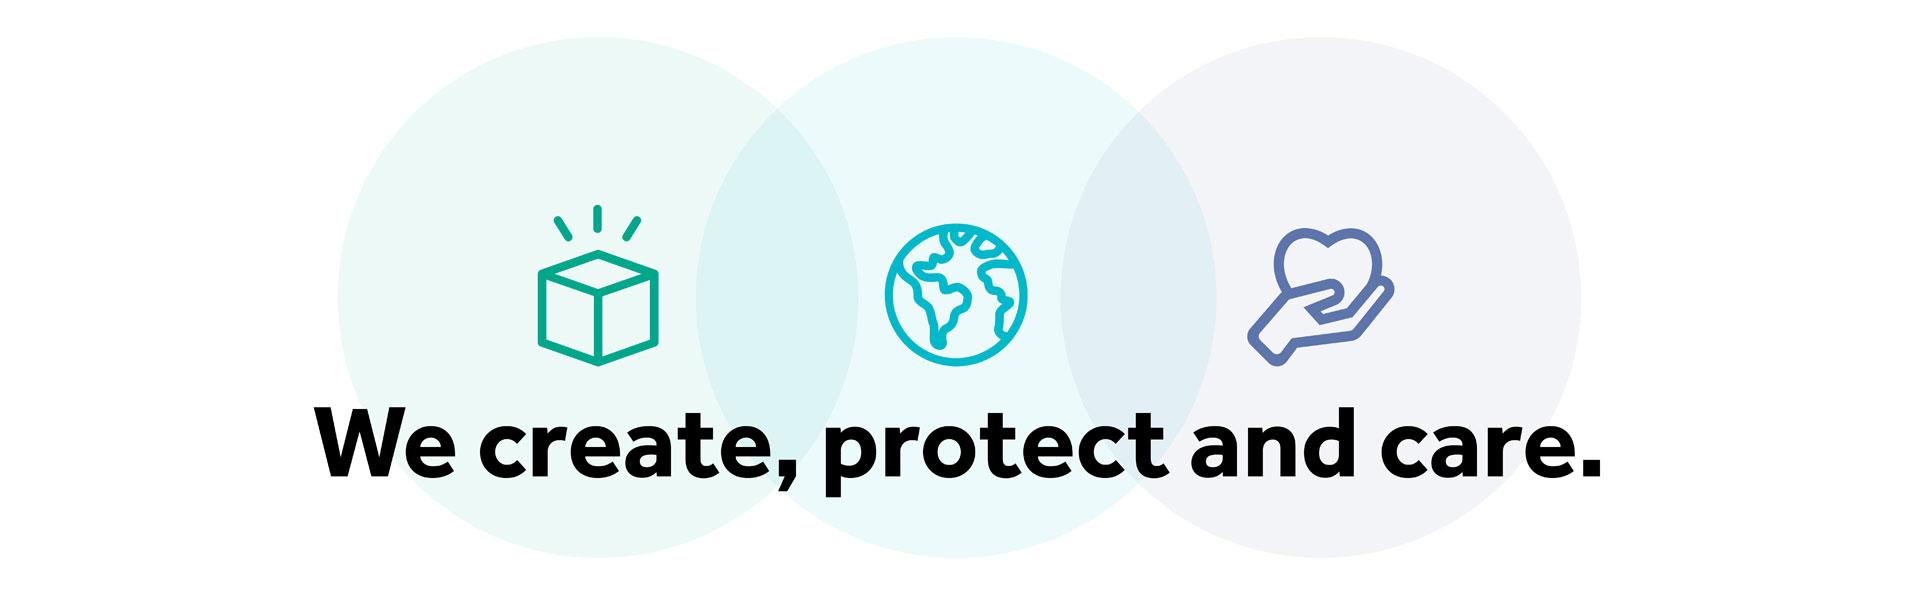 Purpose - Create, Protect and Care